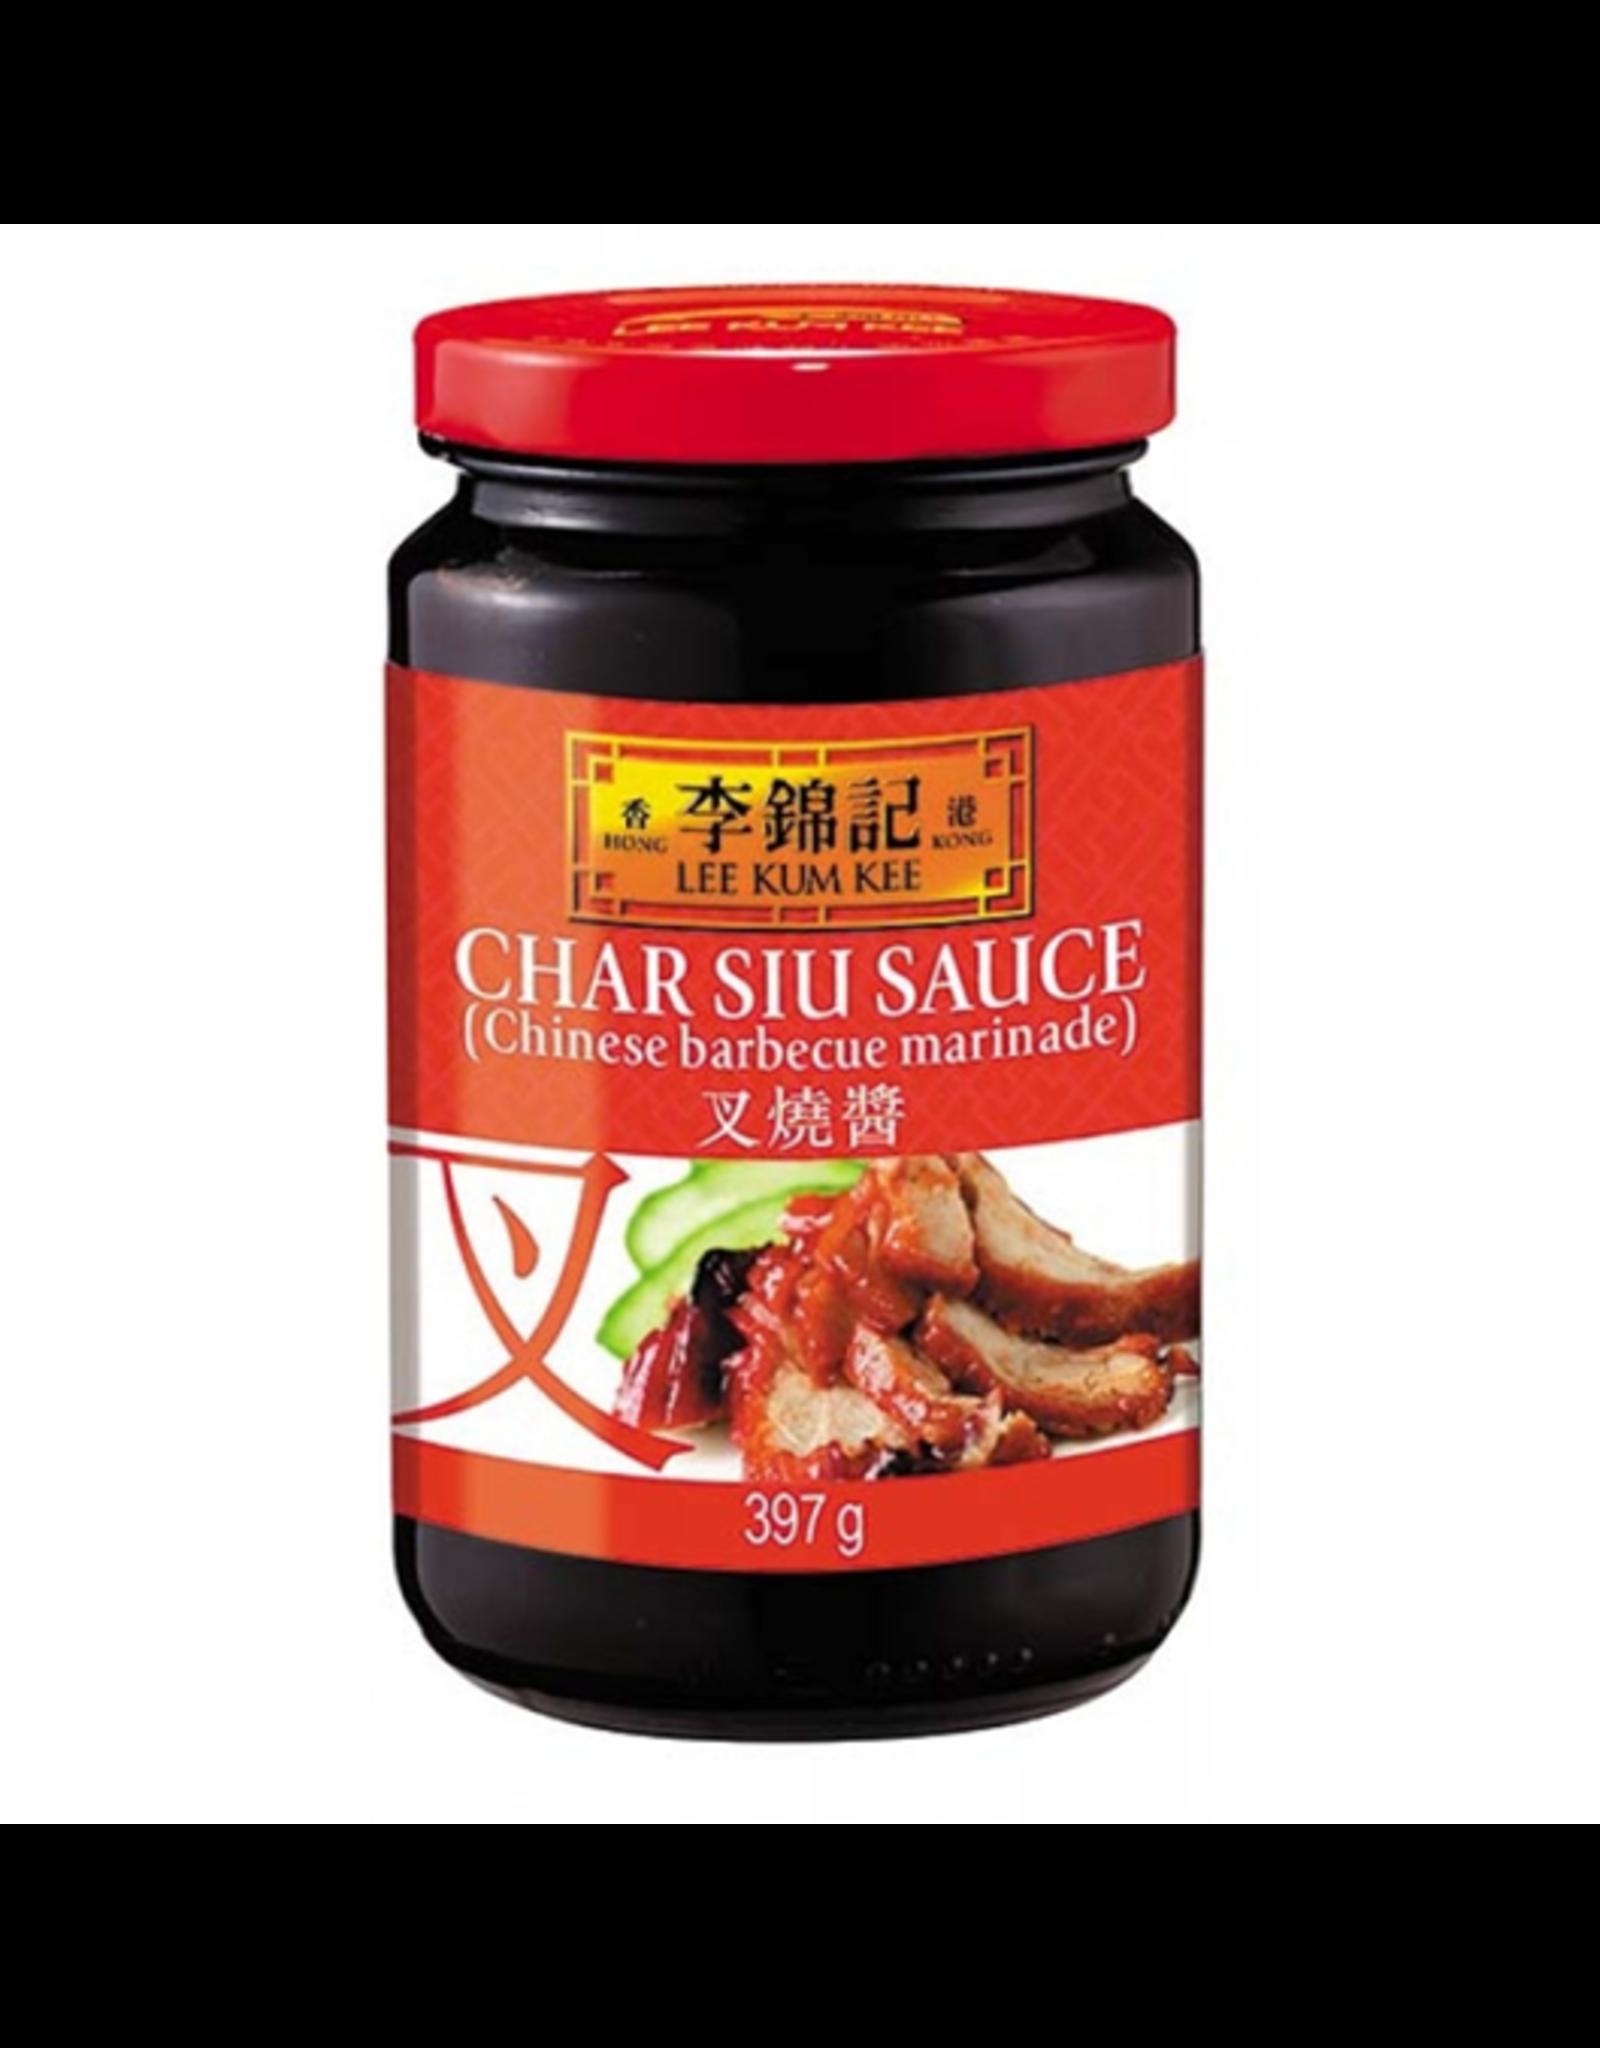 Lee Kum Kee Char Sui sauce